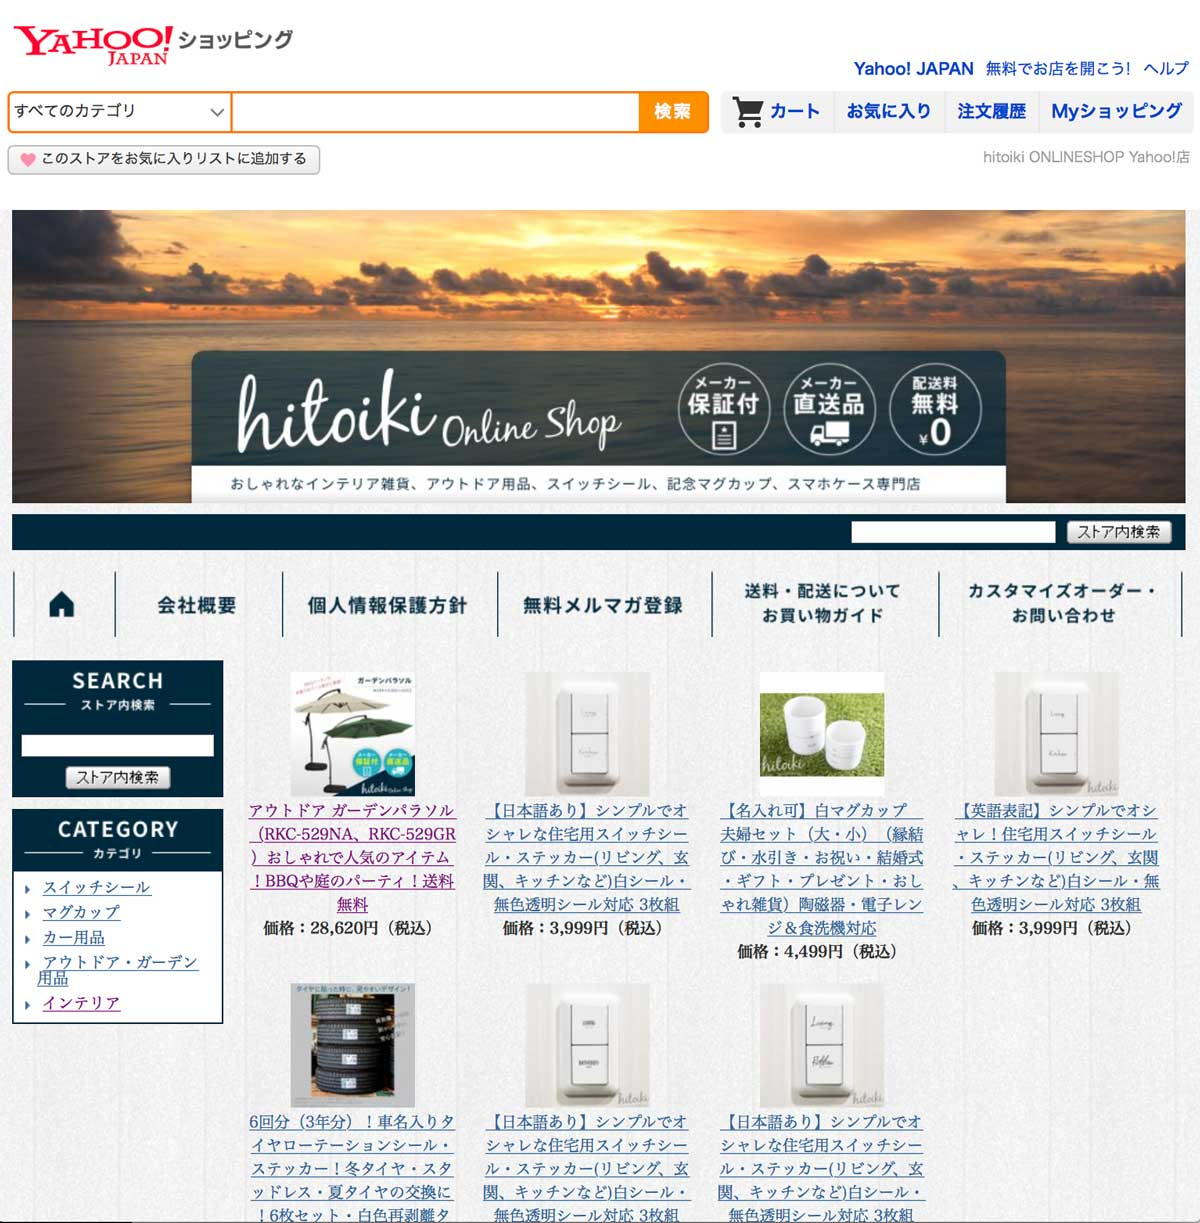 hitoiki(ひといき)運営の公式通販ショップ一覧!Yahoo!や楽天市場、Amazonにも展開中! hitoiki_onlineshop_yahoo